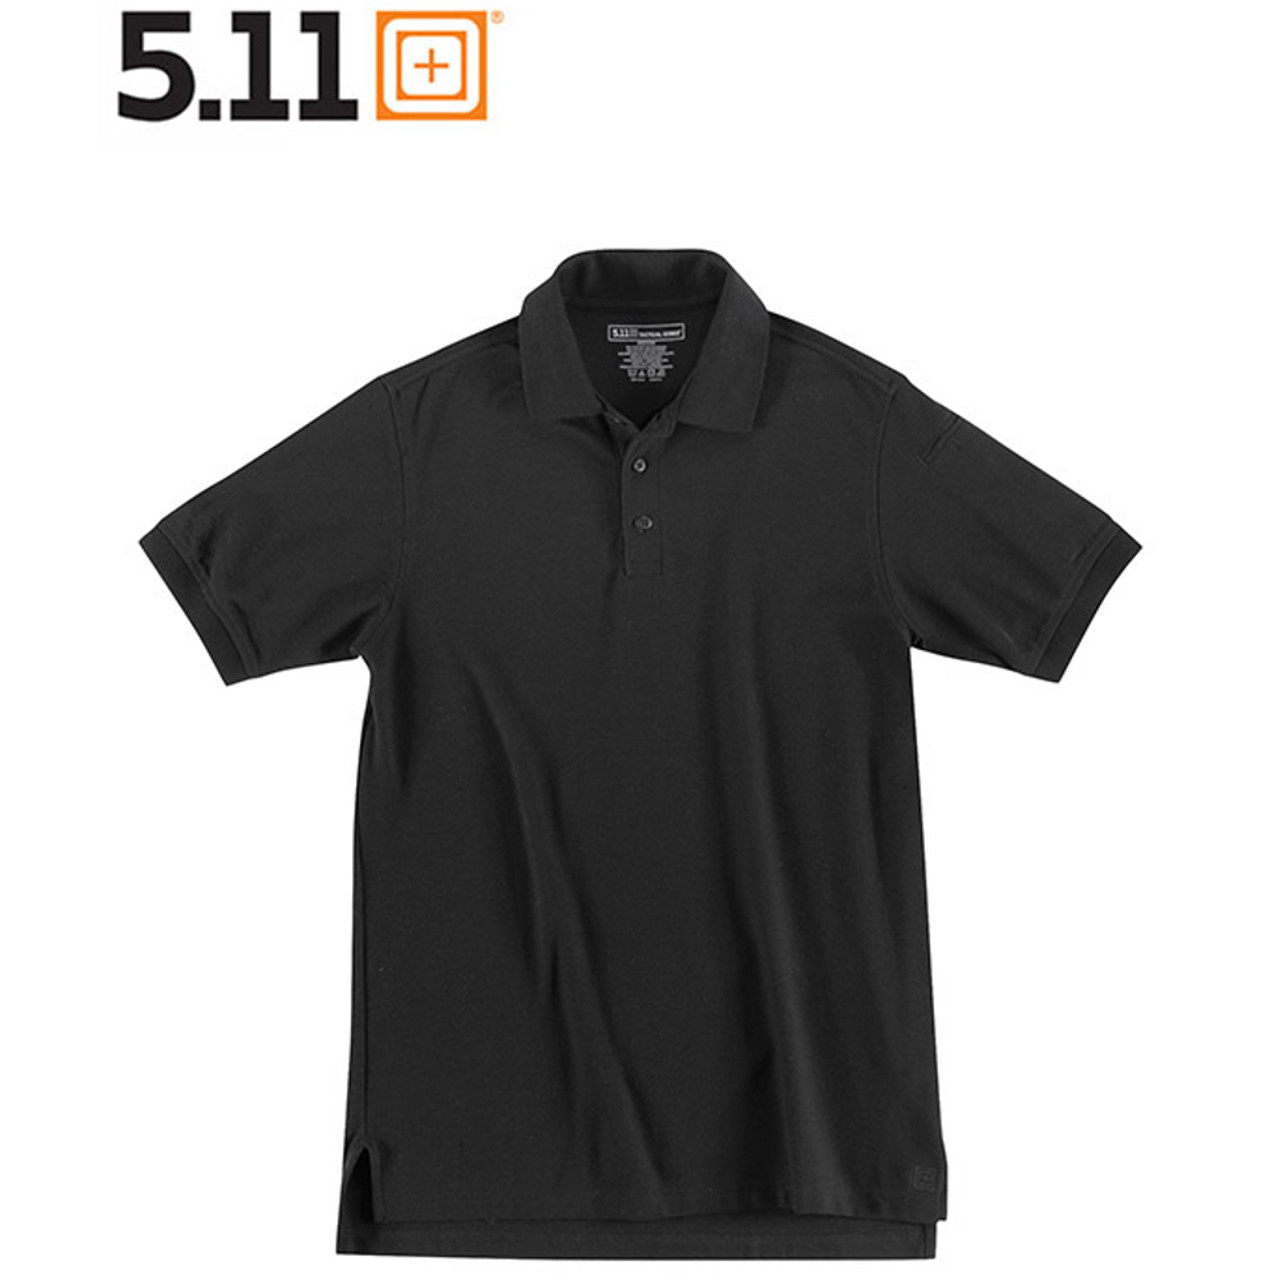 5.11 UTILITY POLO Kurzarm-Shirt black